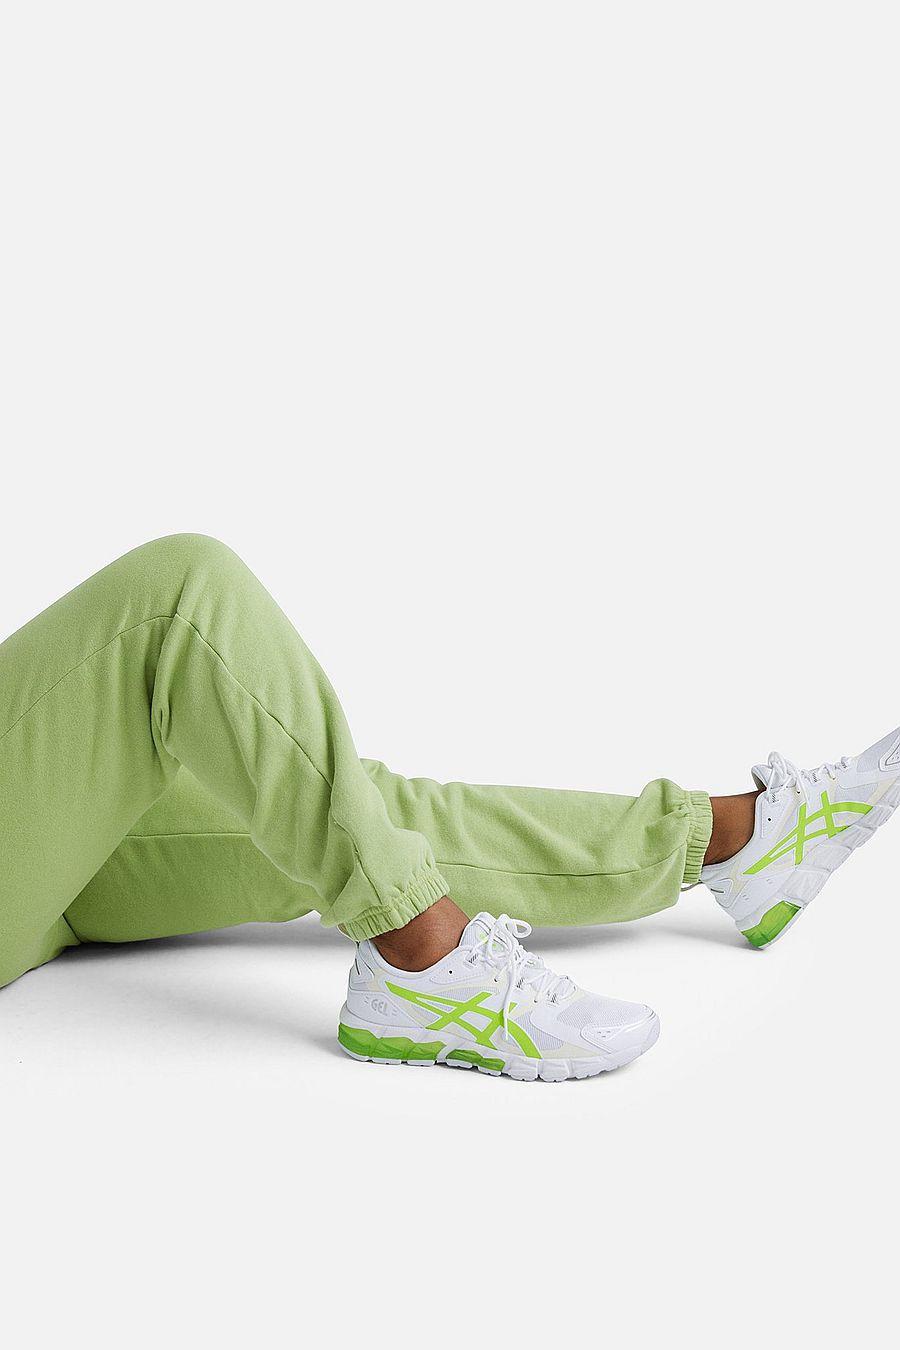 MATE The Label Fleece Relaxed Pocket Sweatpant - PISTACHIO